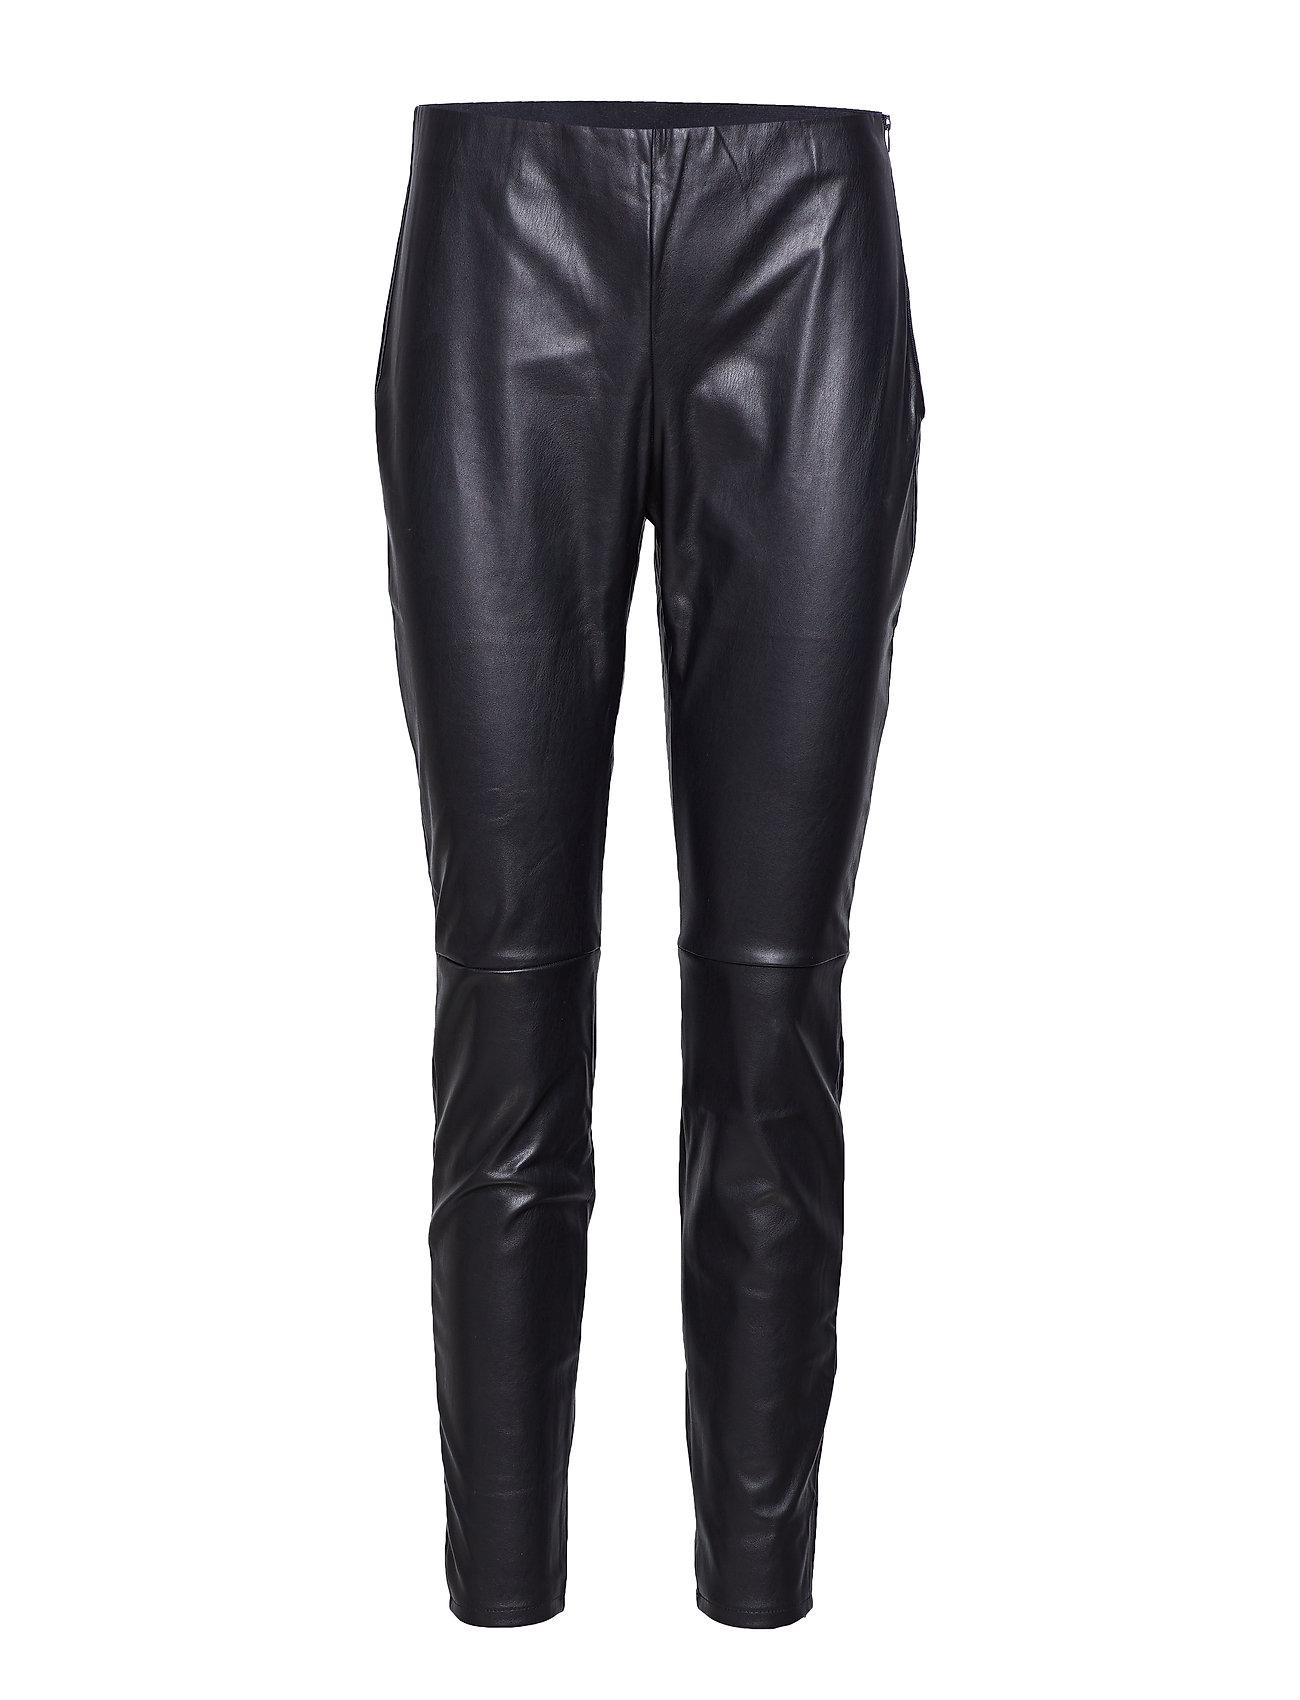 Twist & Tango Arleen Trousers - BLACK